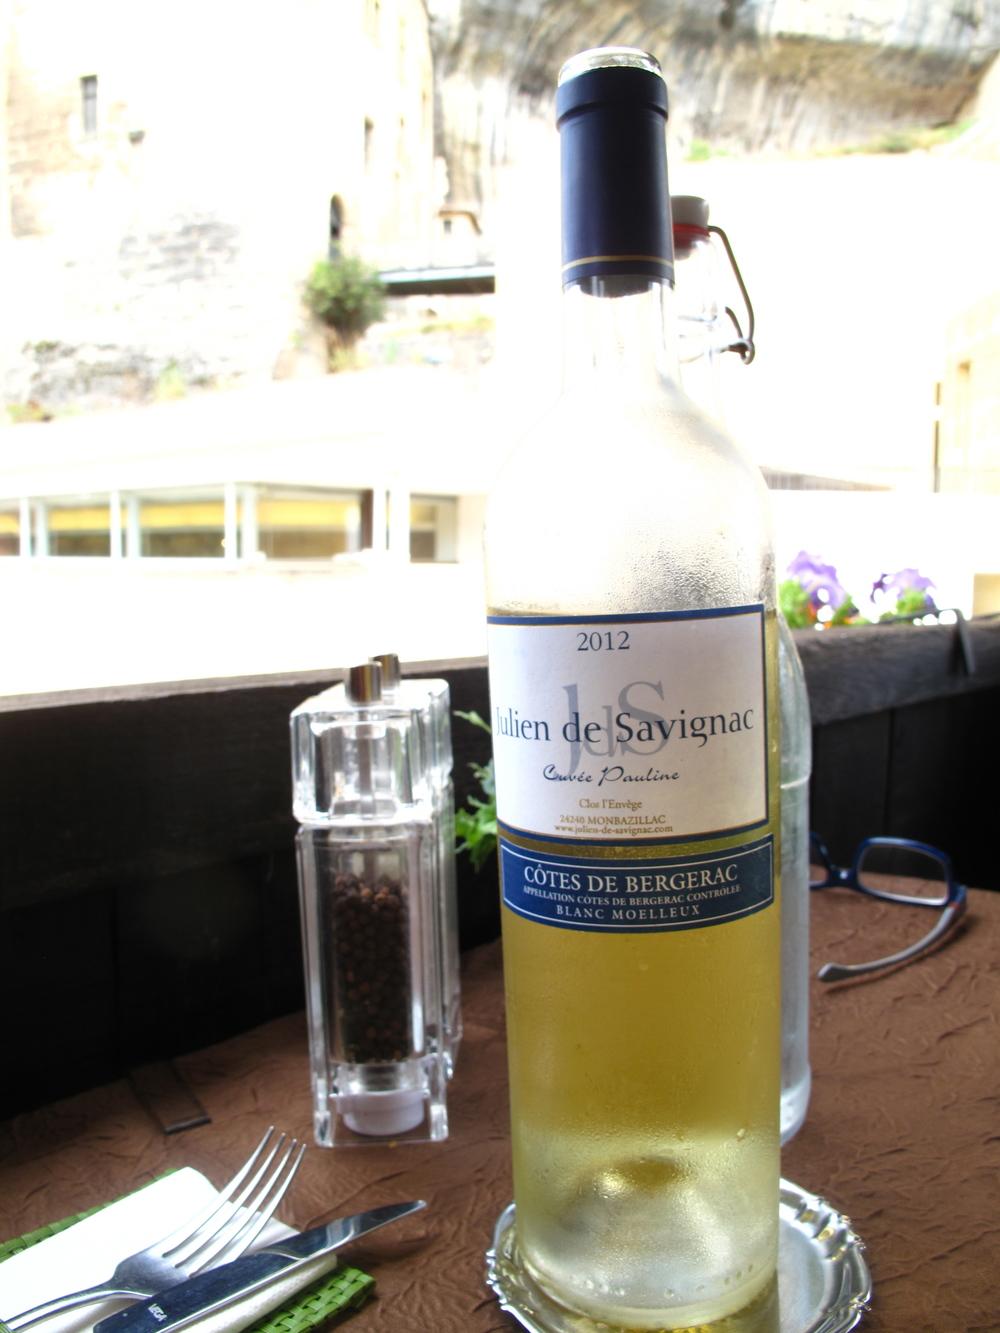 Cotes du Bergerac white wine.